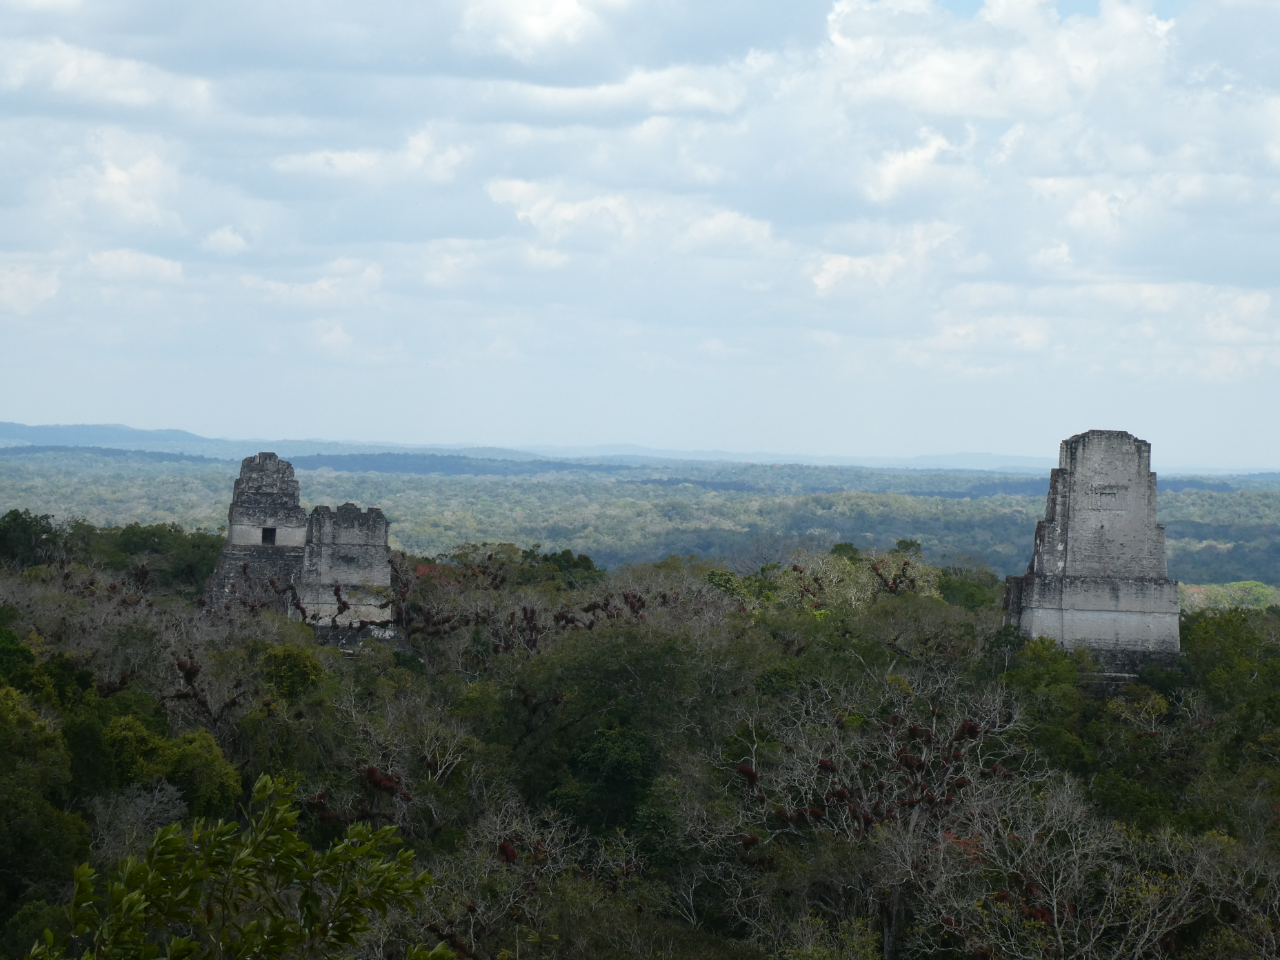 Photo 1: Tikal, la merveille - Guatemala